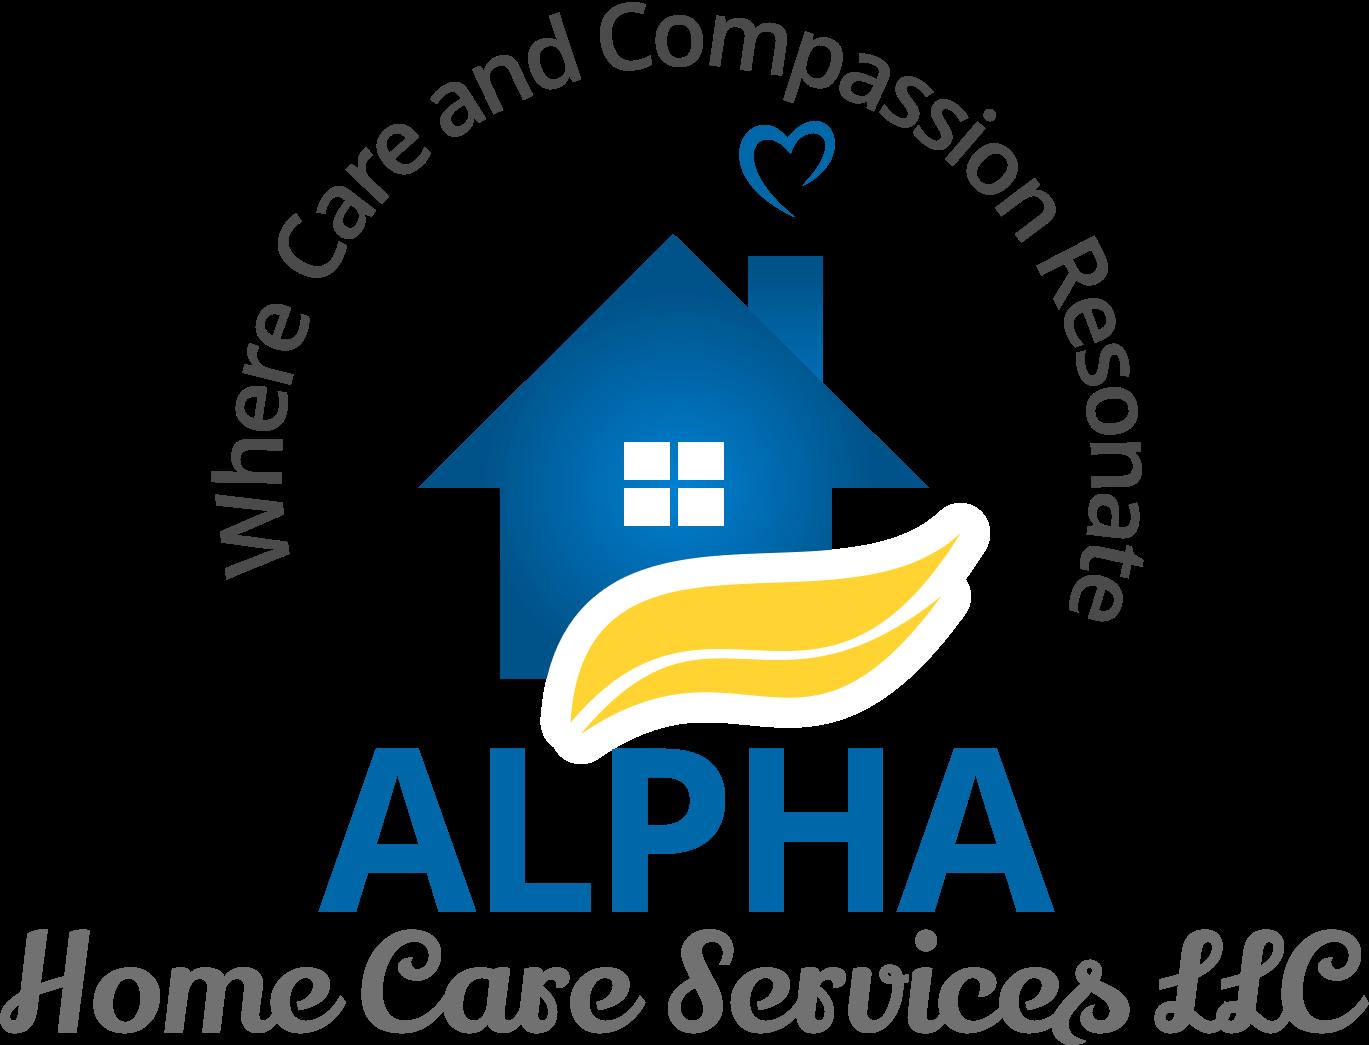 Alpha Home Care Services LLC